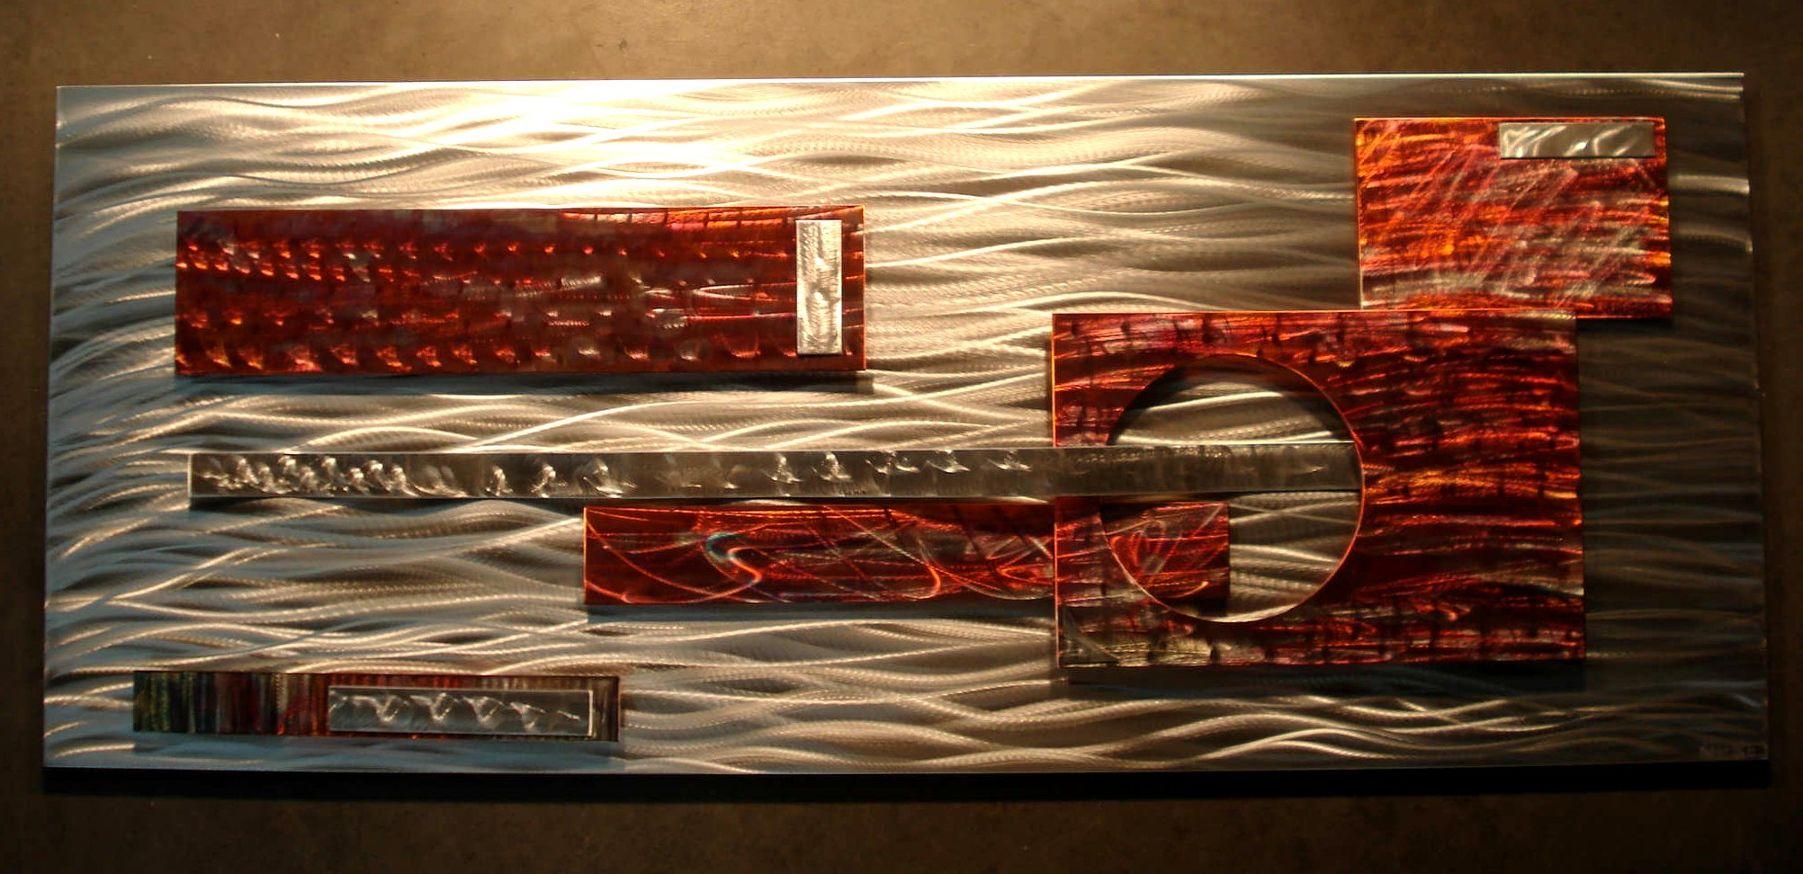 NY0619M - Metal Art by Nicholas Yust, Alternate Angle 3